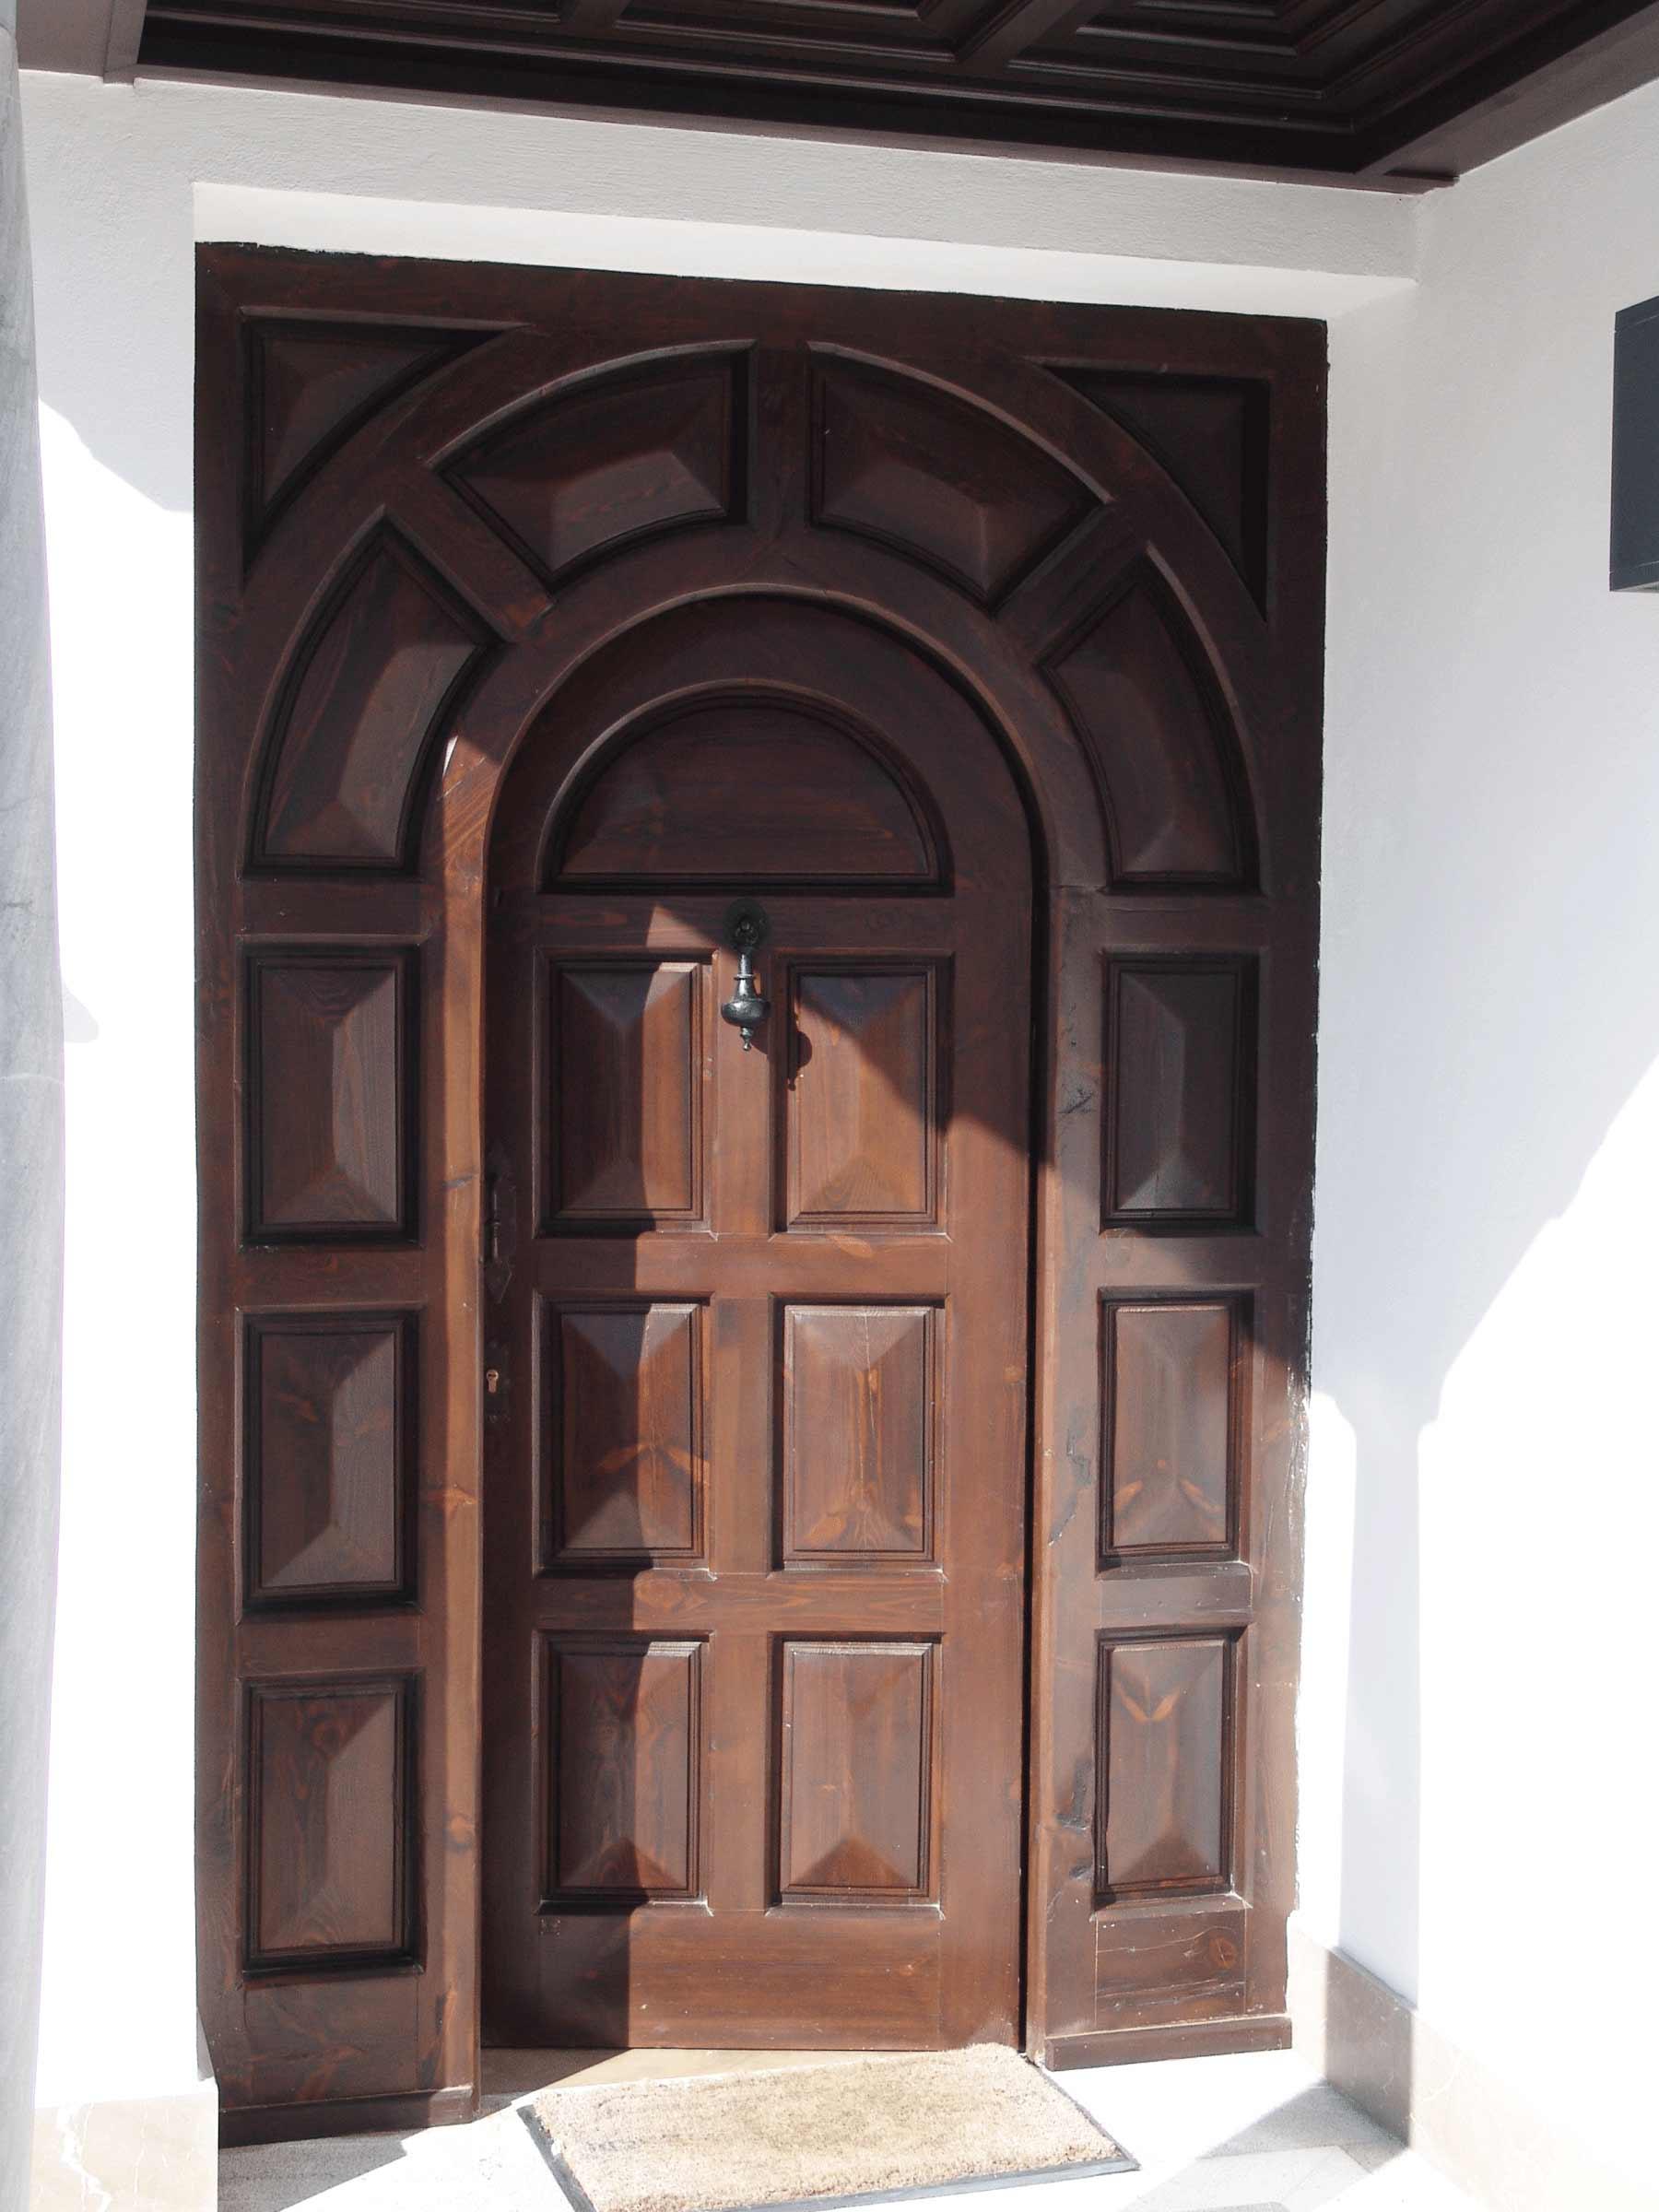 Puerta con embocadora